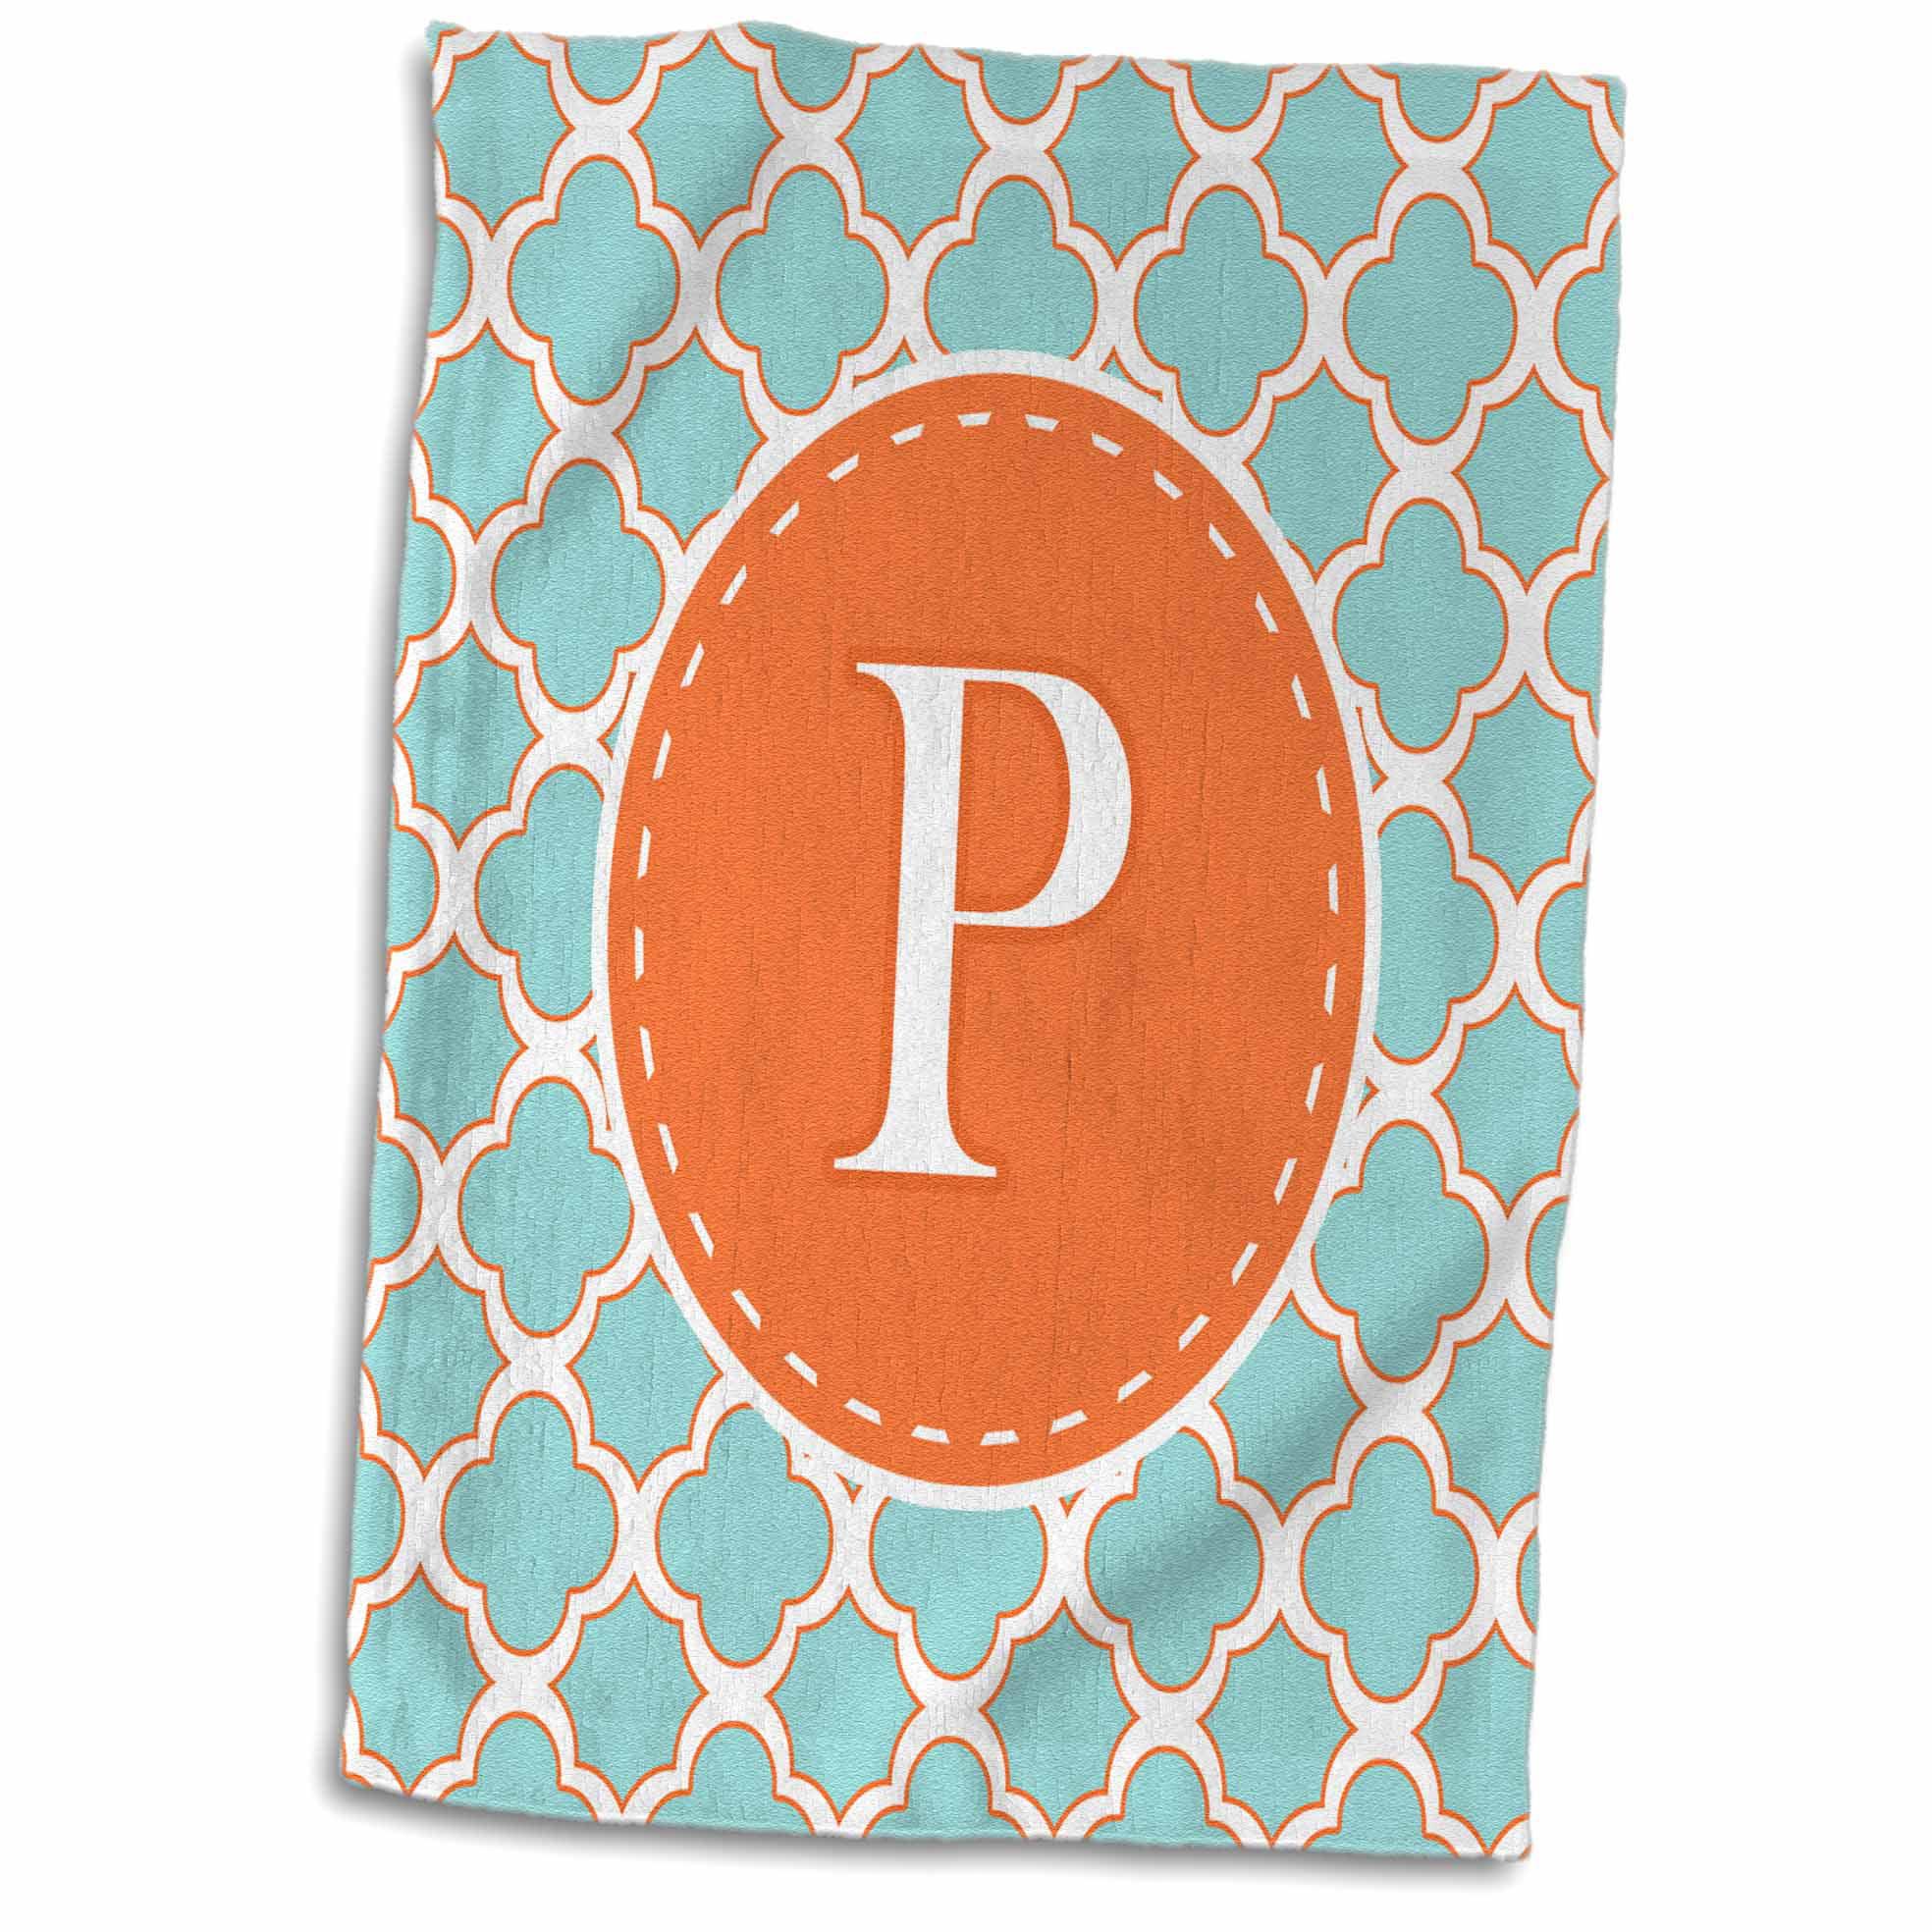 3dRose Letter P Monogram Orange and Blue Quatrefoil Pattern - Towel, 15 by 22-inch